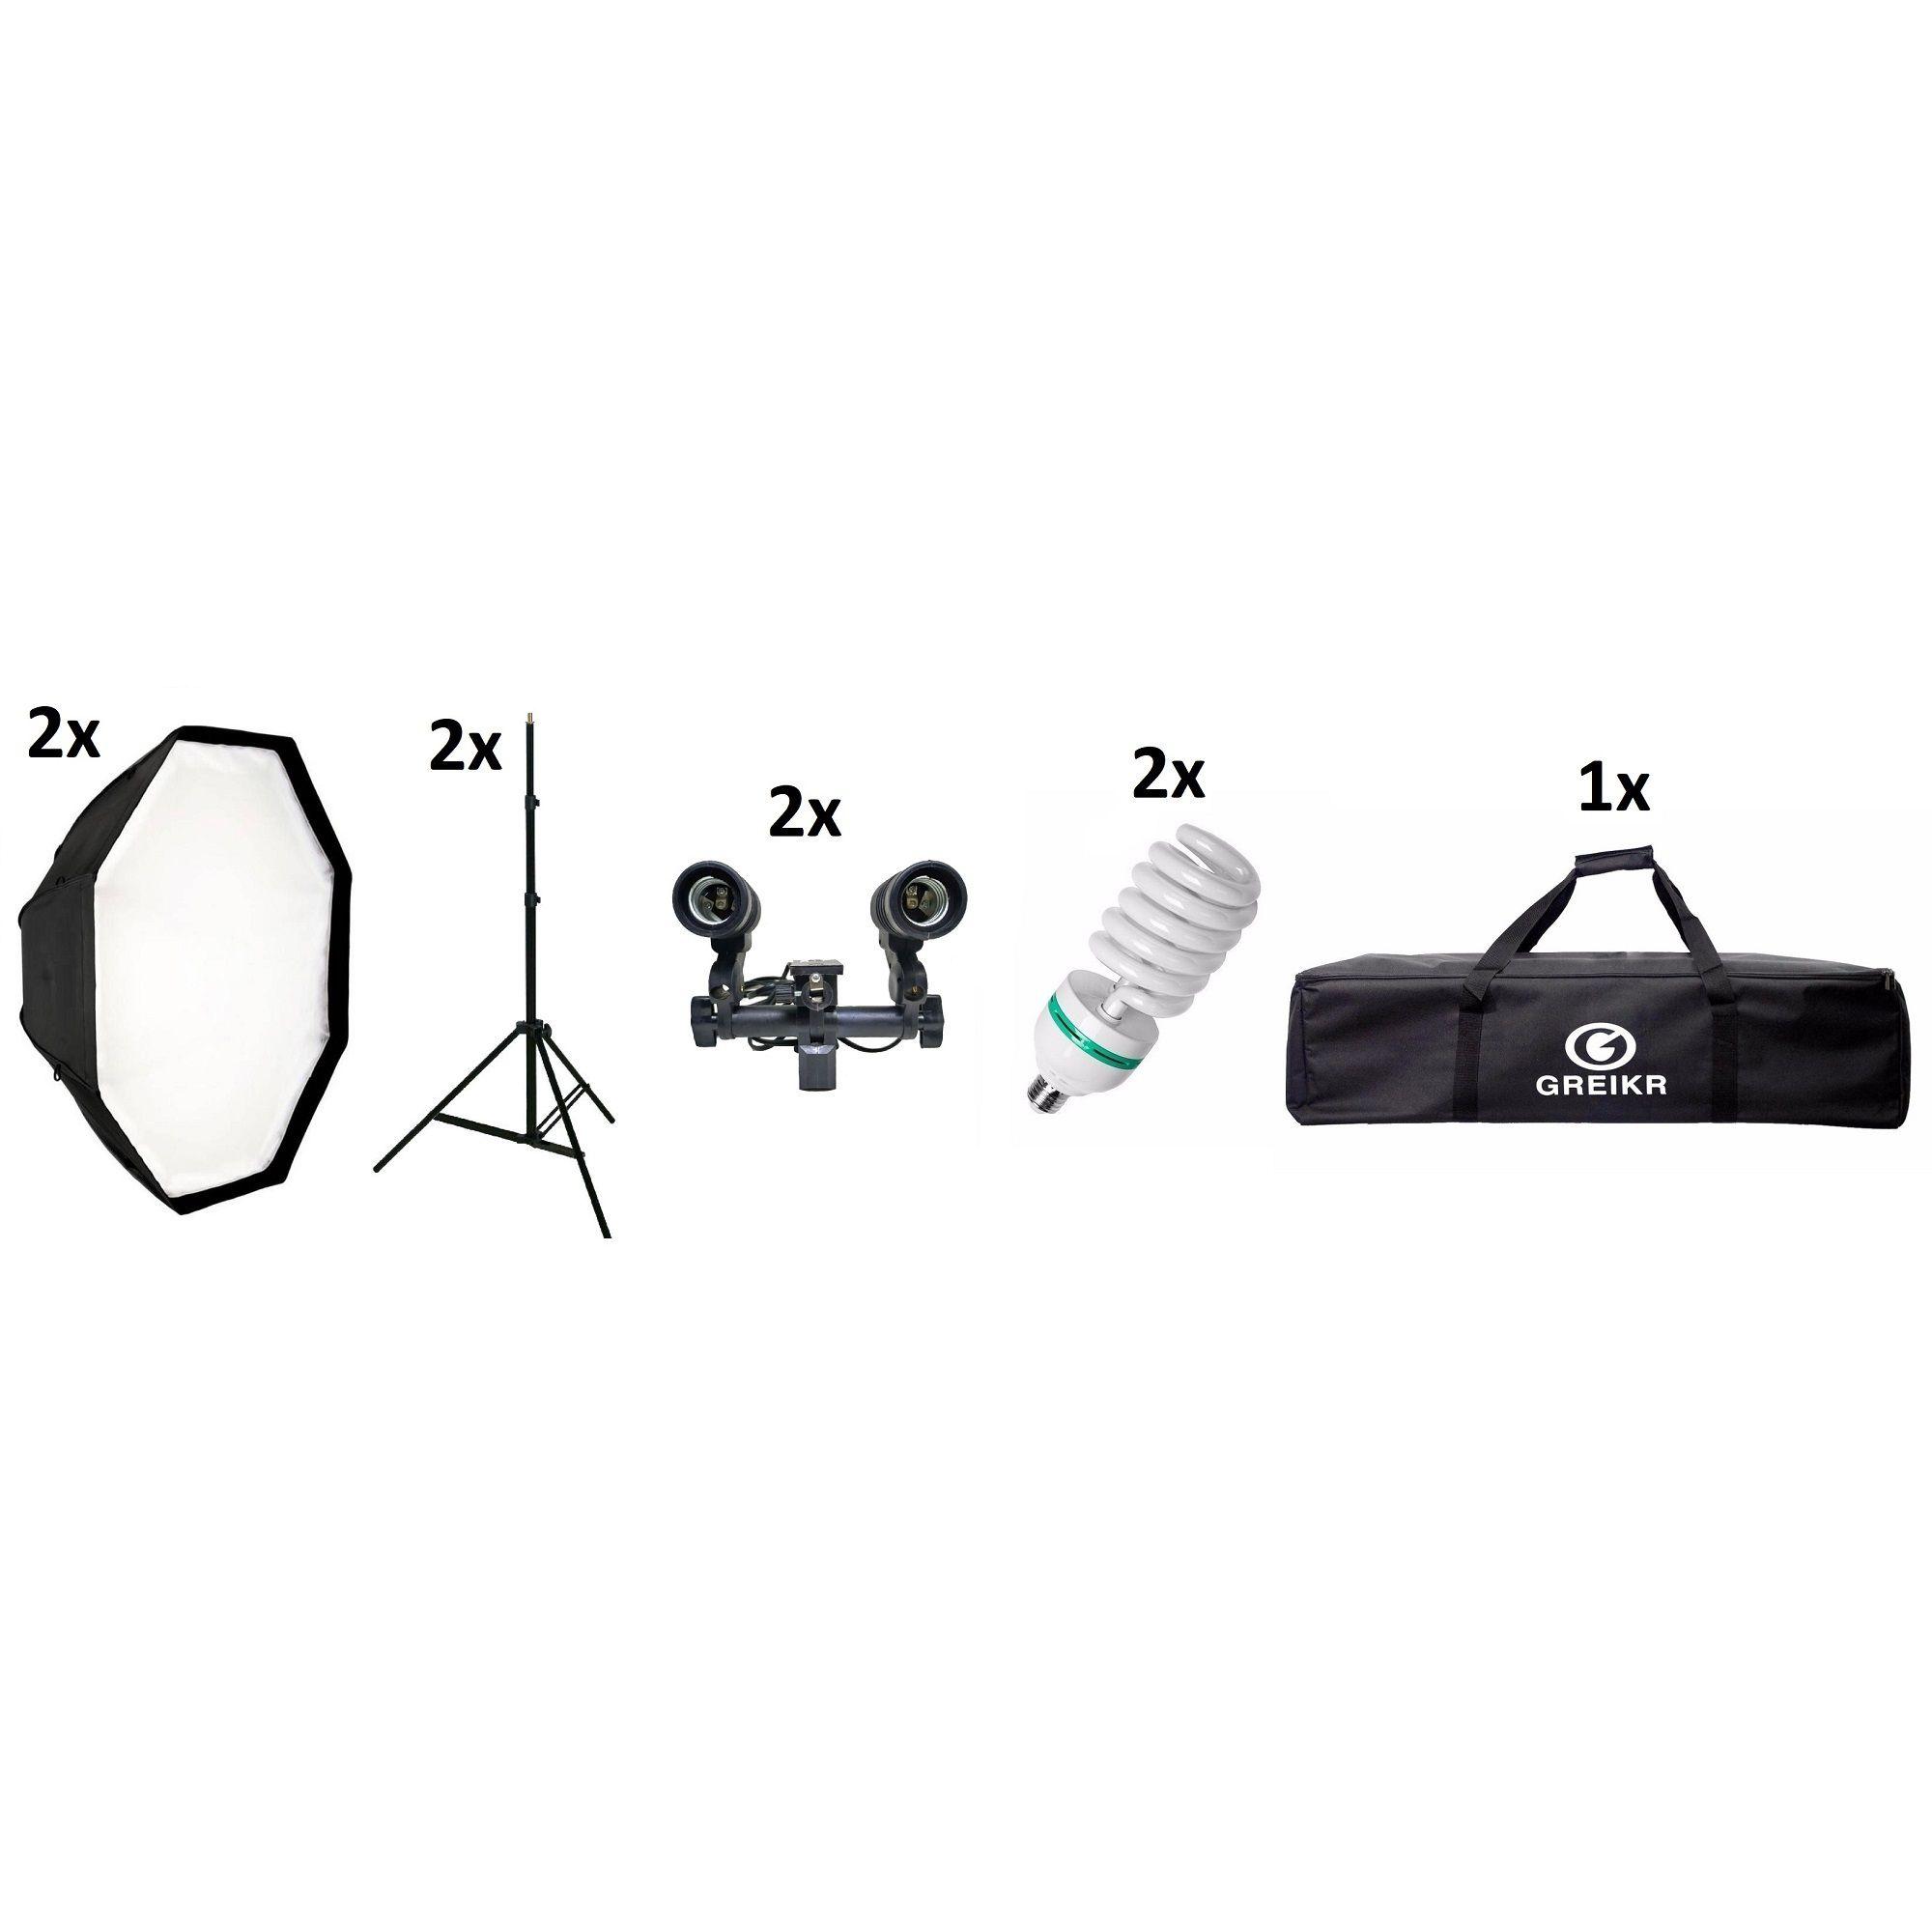 Kit iluminação Estúdio Fotográfico Softbox Octabox 120cm + Tripé + Sóquete Duplo + Lâmpada + Bolsa - 120CM+ST803+SOQUETEDUPLO+11045W+YA5027